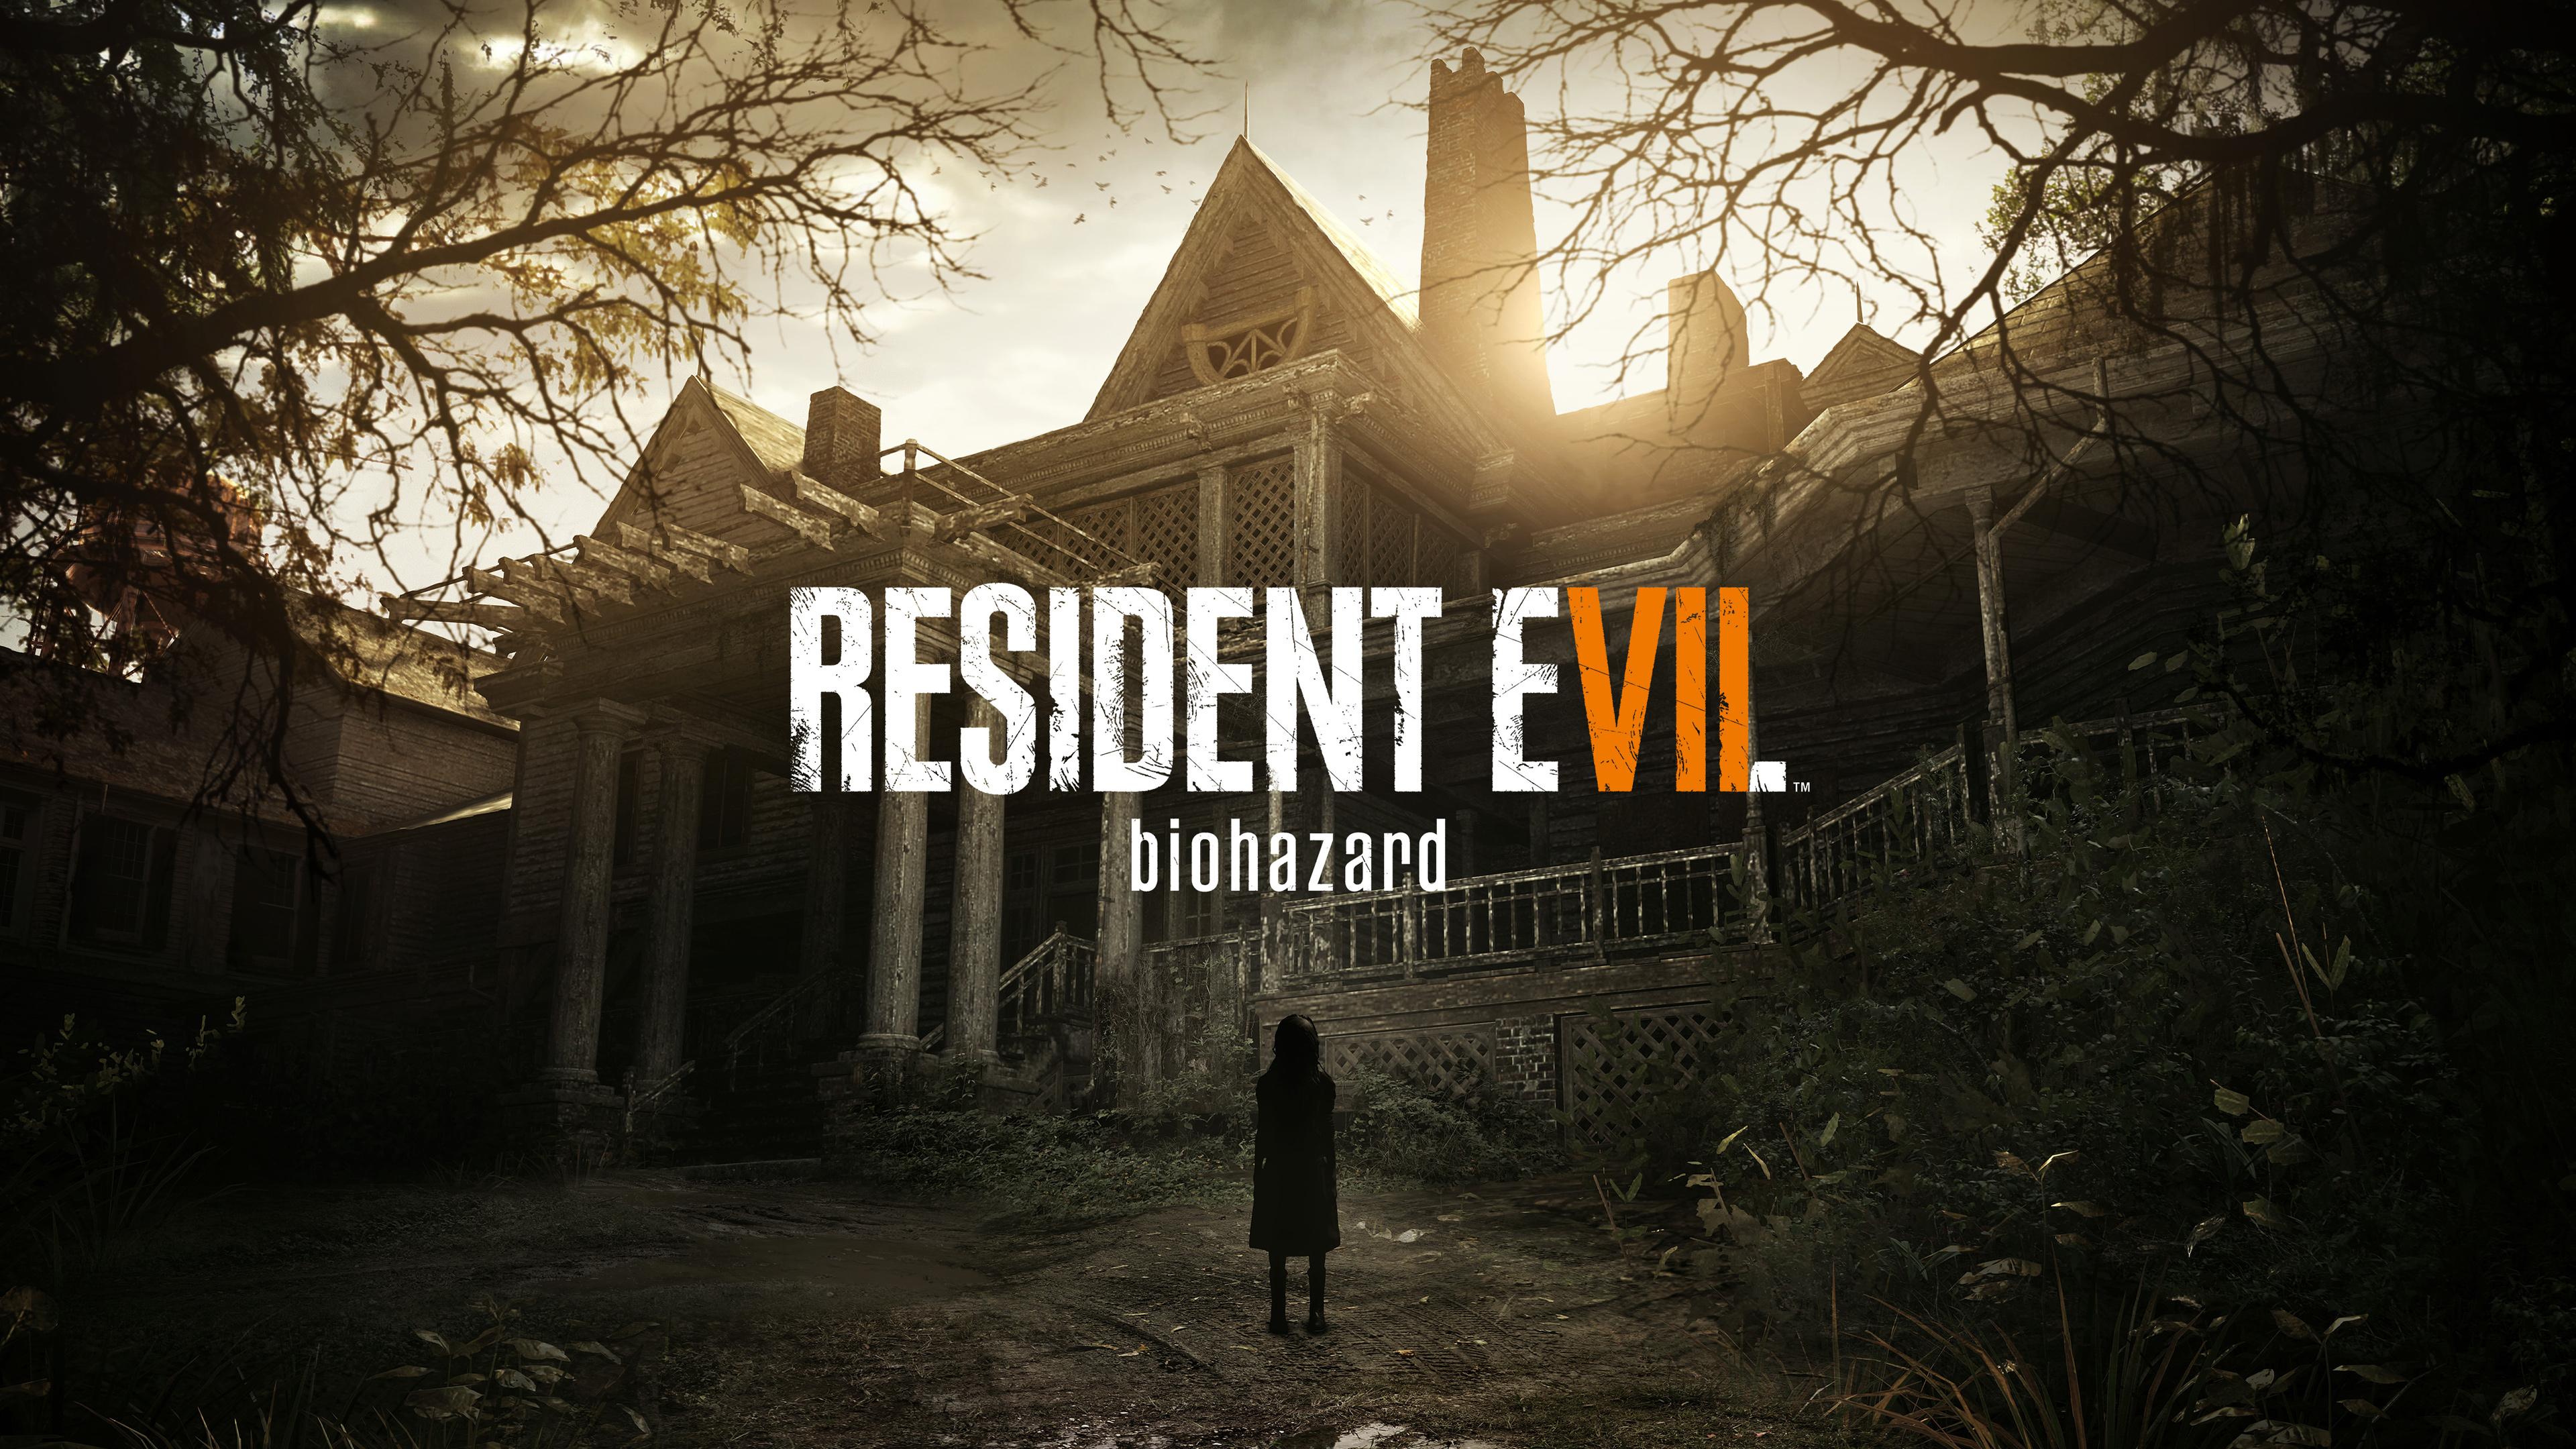 Resident Evil 7 ตั้งเป้าไว้ที่ 10 ล้านแผ่น แต่วางจำหน่ายได้เพียง 4 ล้านแผ่น